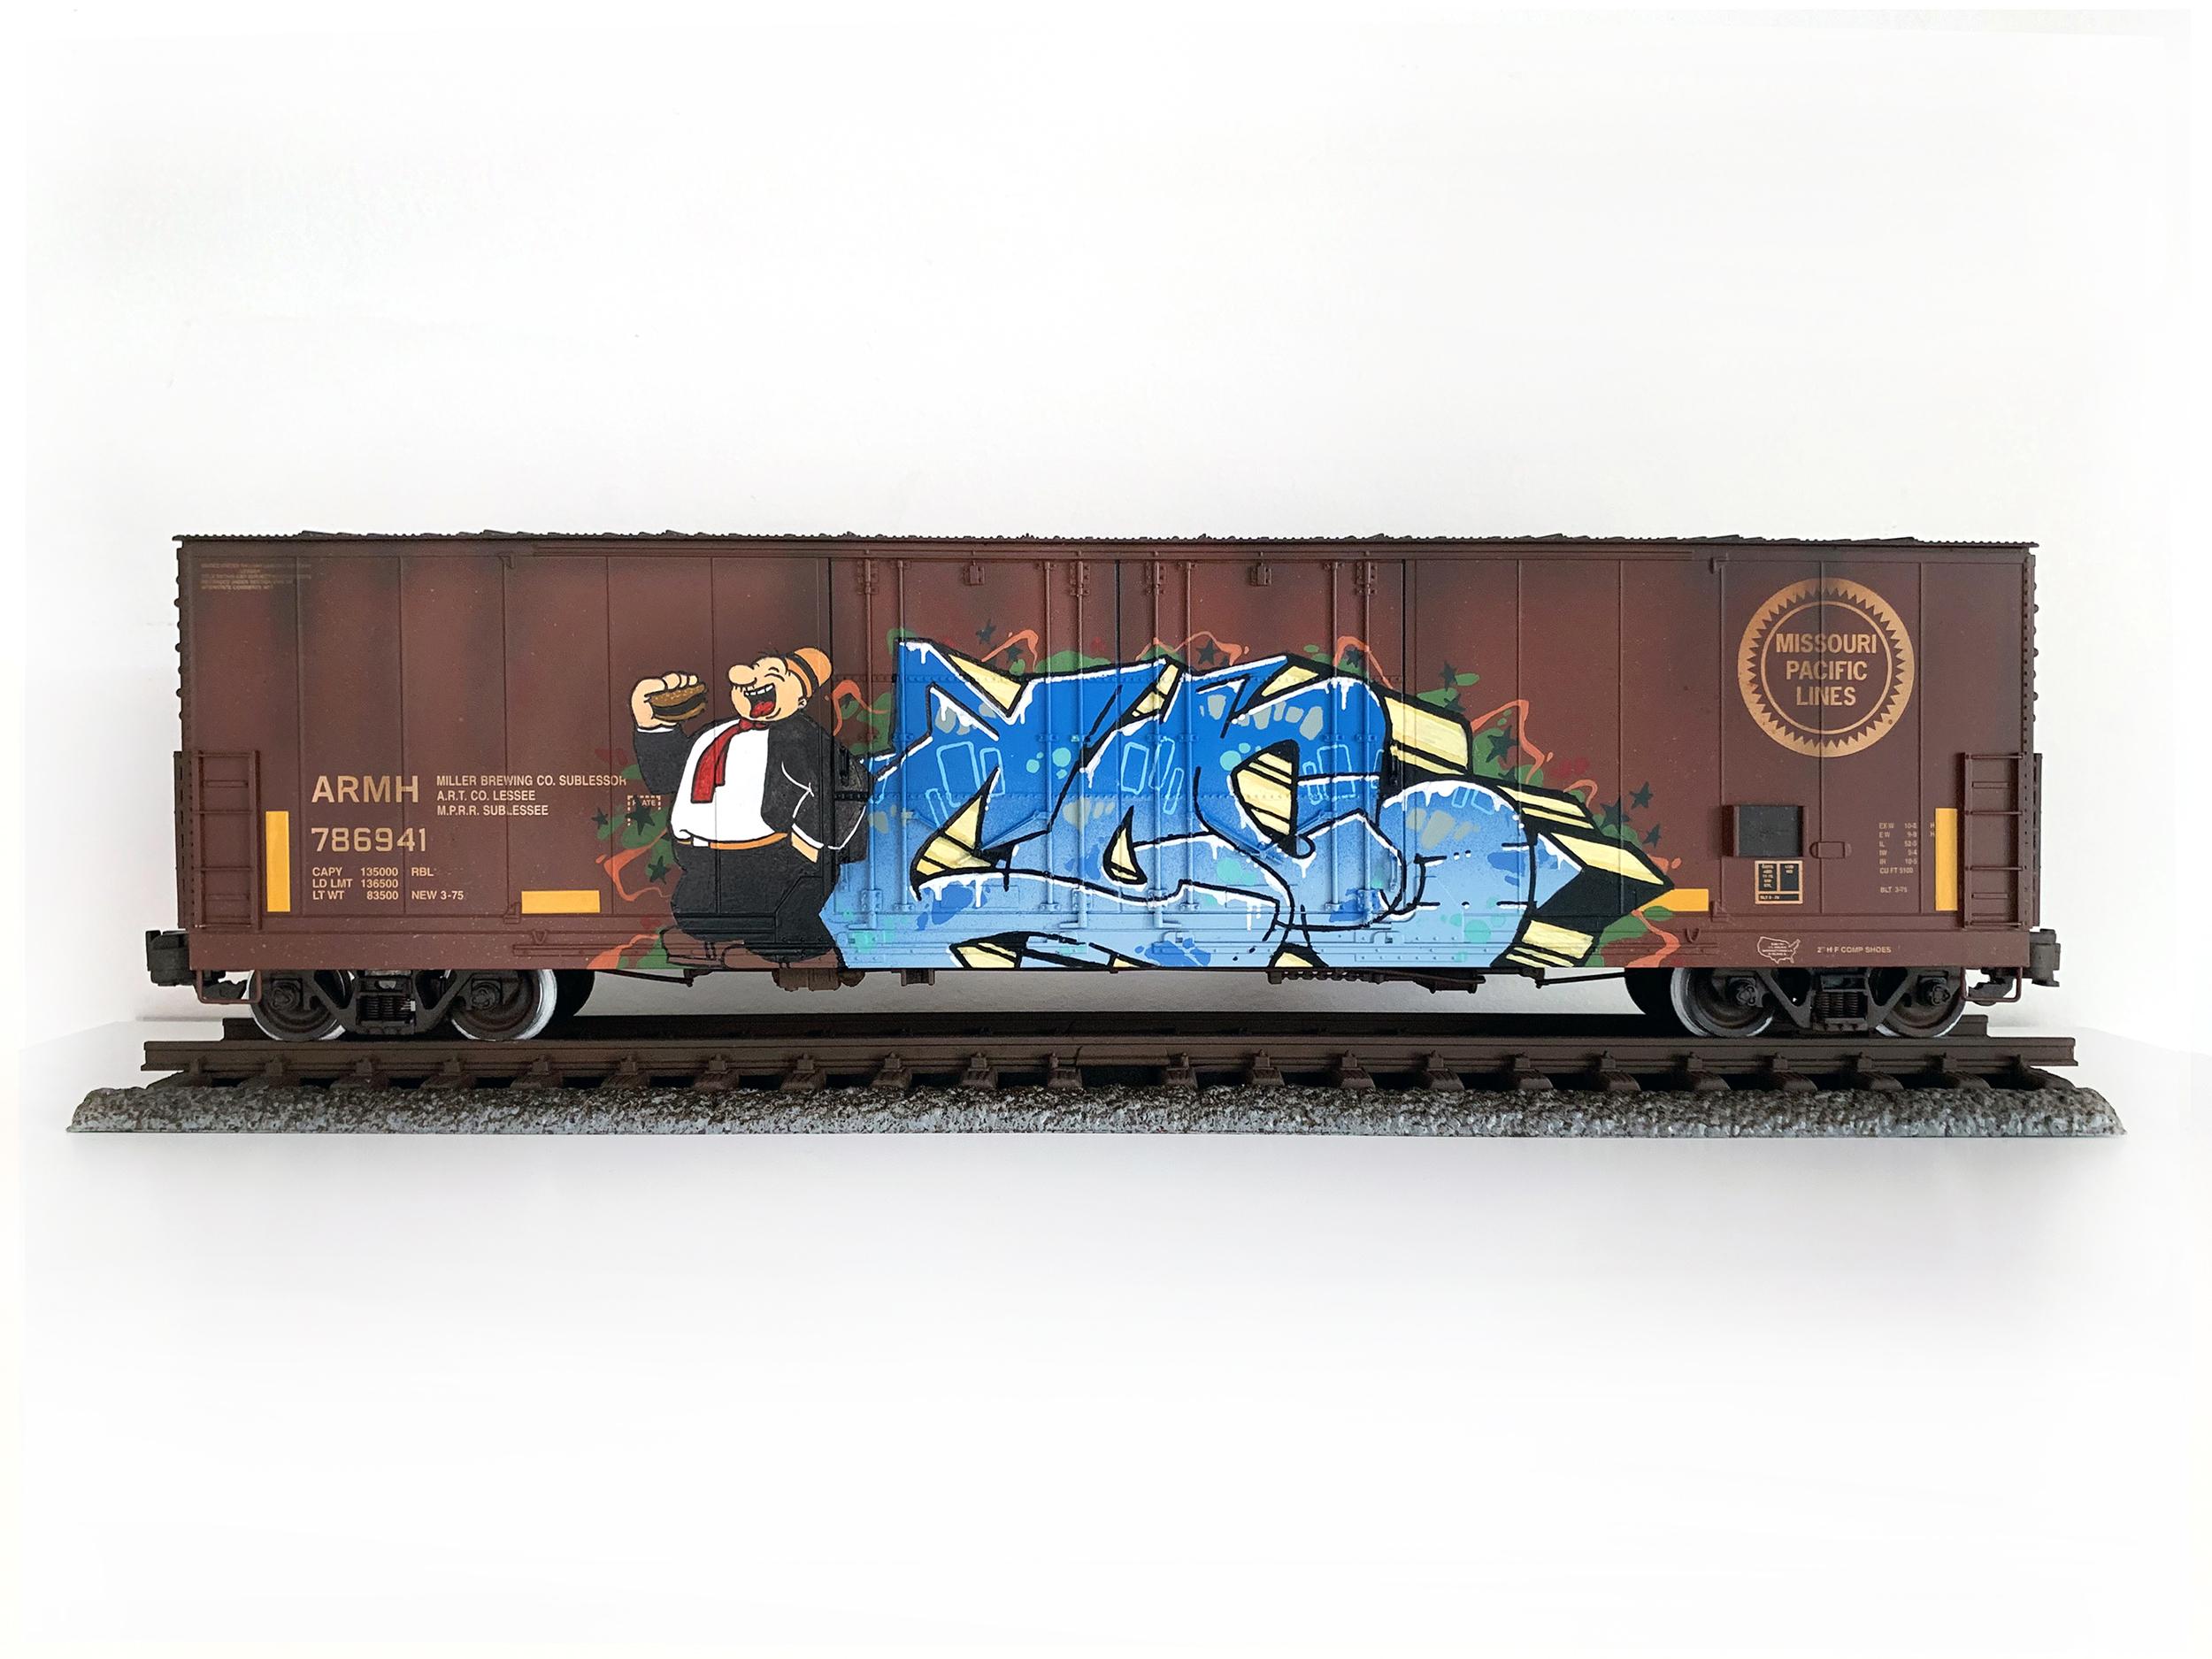 MP #6, G Scale Train, Freight Train Graffiti, Boxcar Art, Railroad Art, Tim Conlon Art